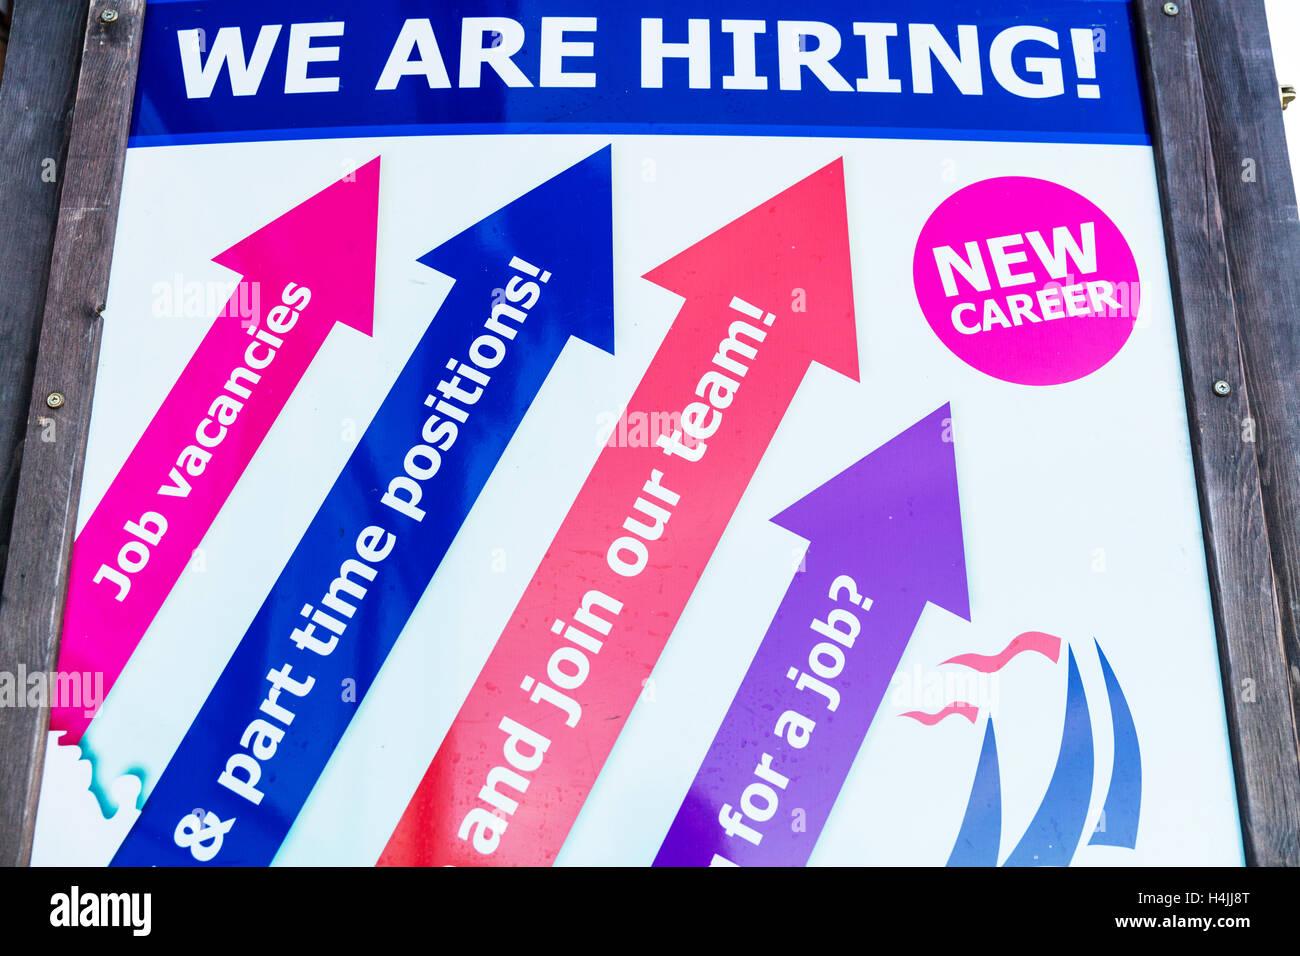 hiring jobs job vacancies sign hiring career new jobs employ stock hiring jobs job vacancies sign hiring career new jobs employ employment up full or part time vacancy uk england gb